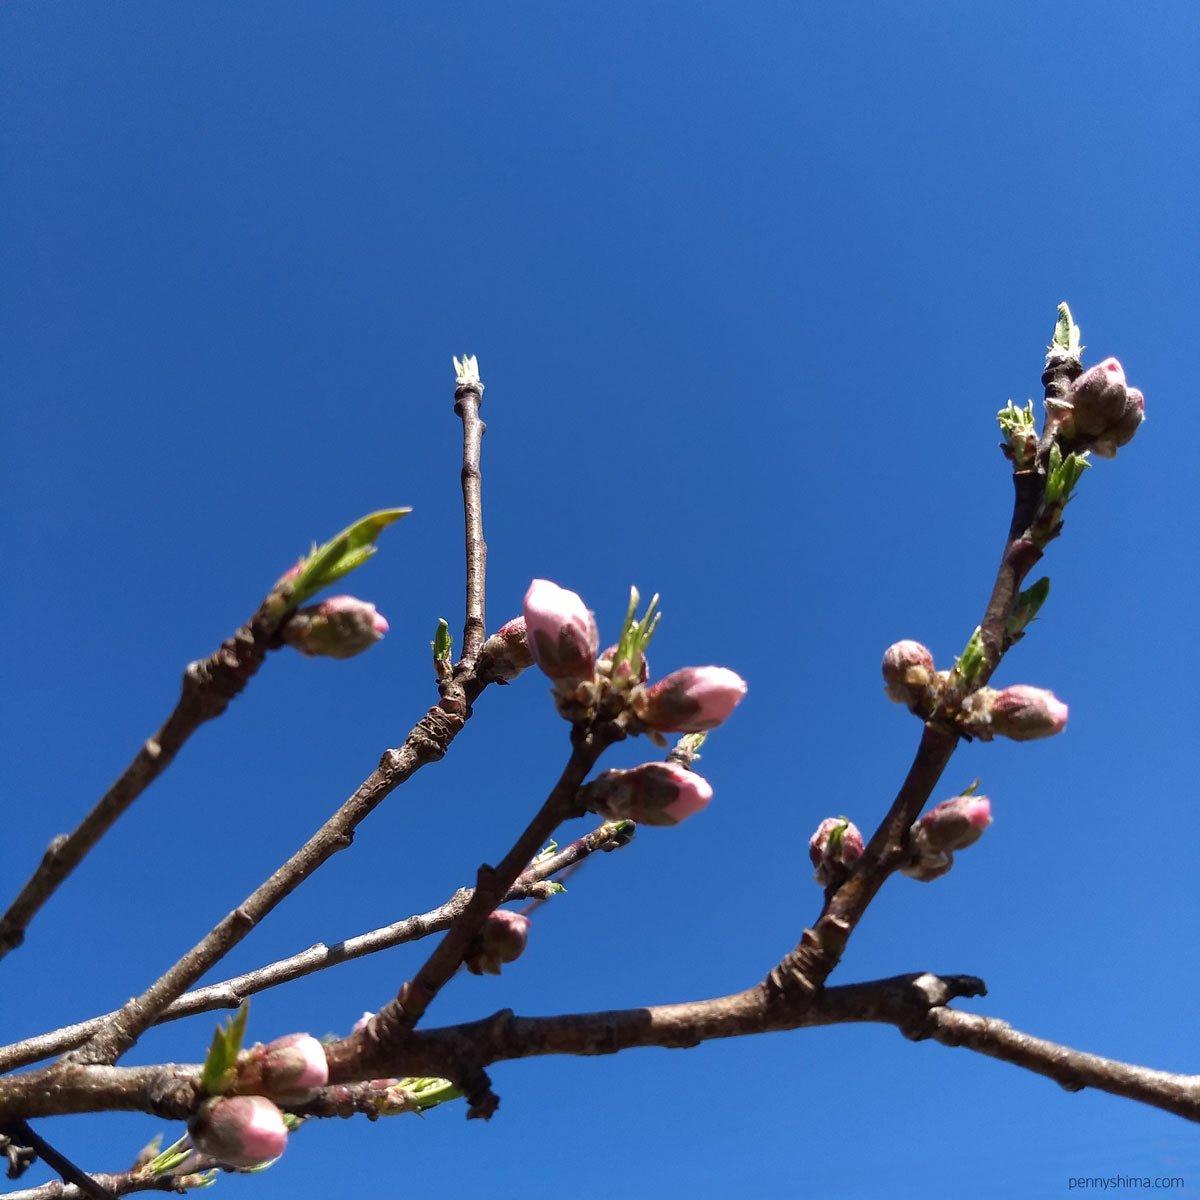 spring cherry tree blossoms and a bright blue sky.